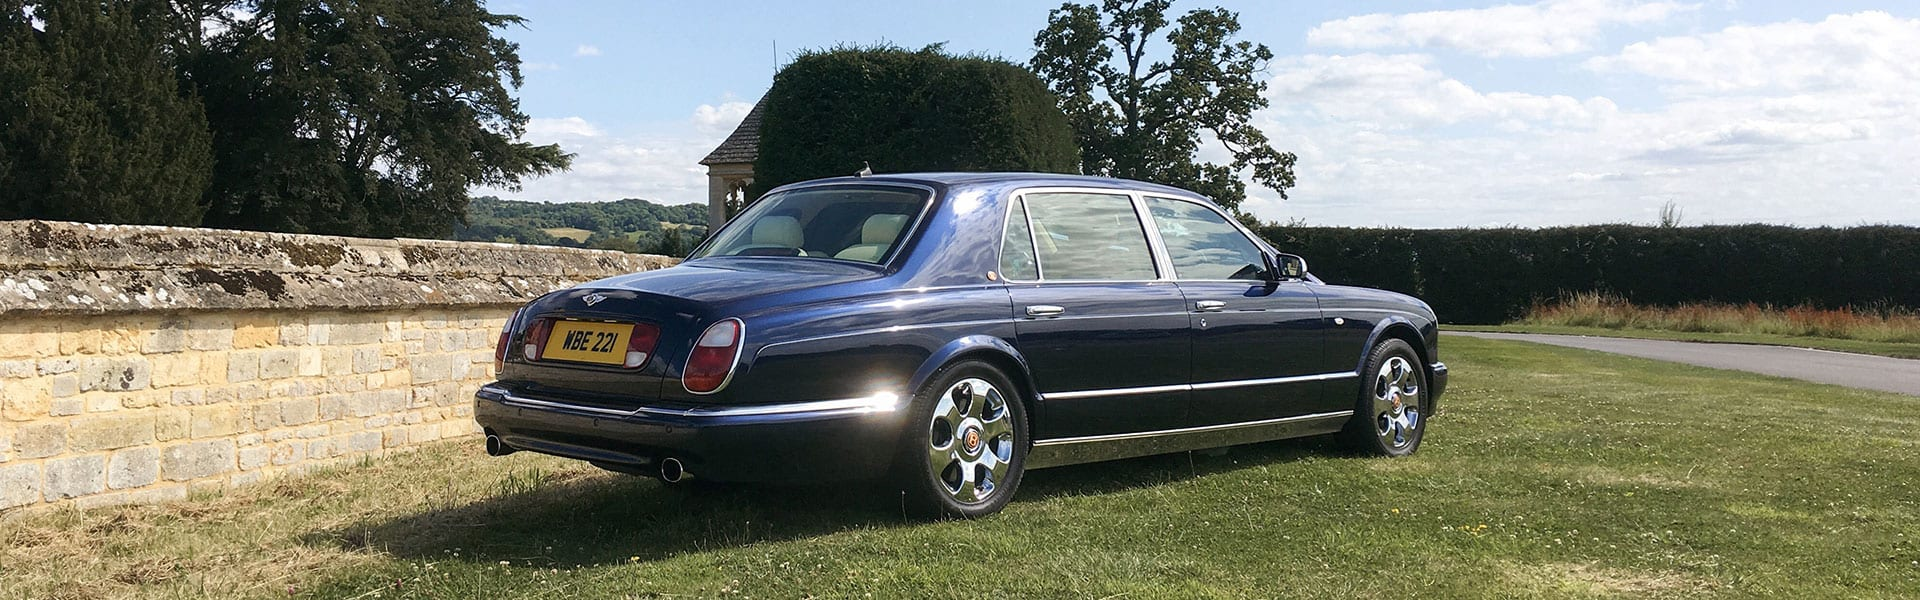 Bentley-Arnage-in-Blue-Hero-Slider-1920×500-4